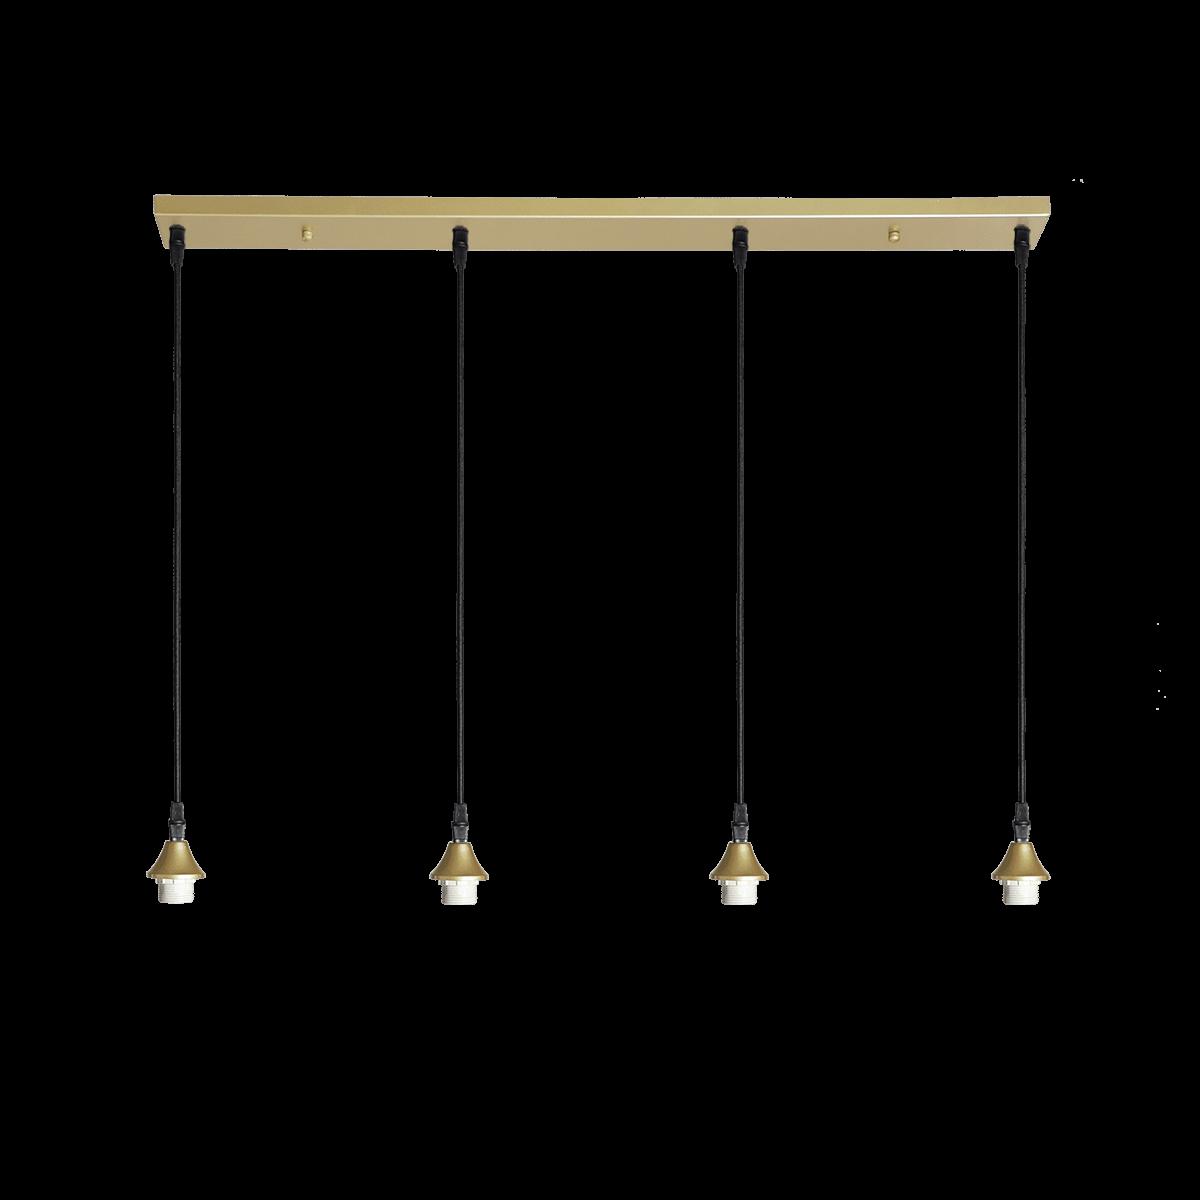 Hanglamp Vilmar 4 lichts goud